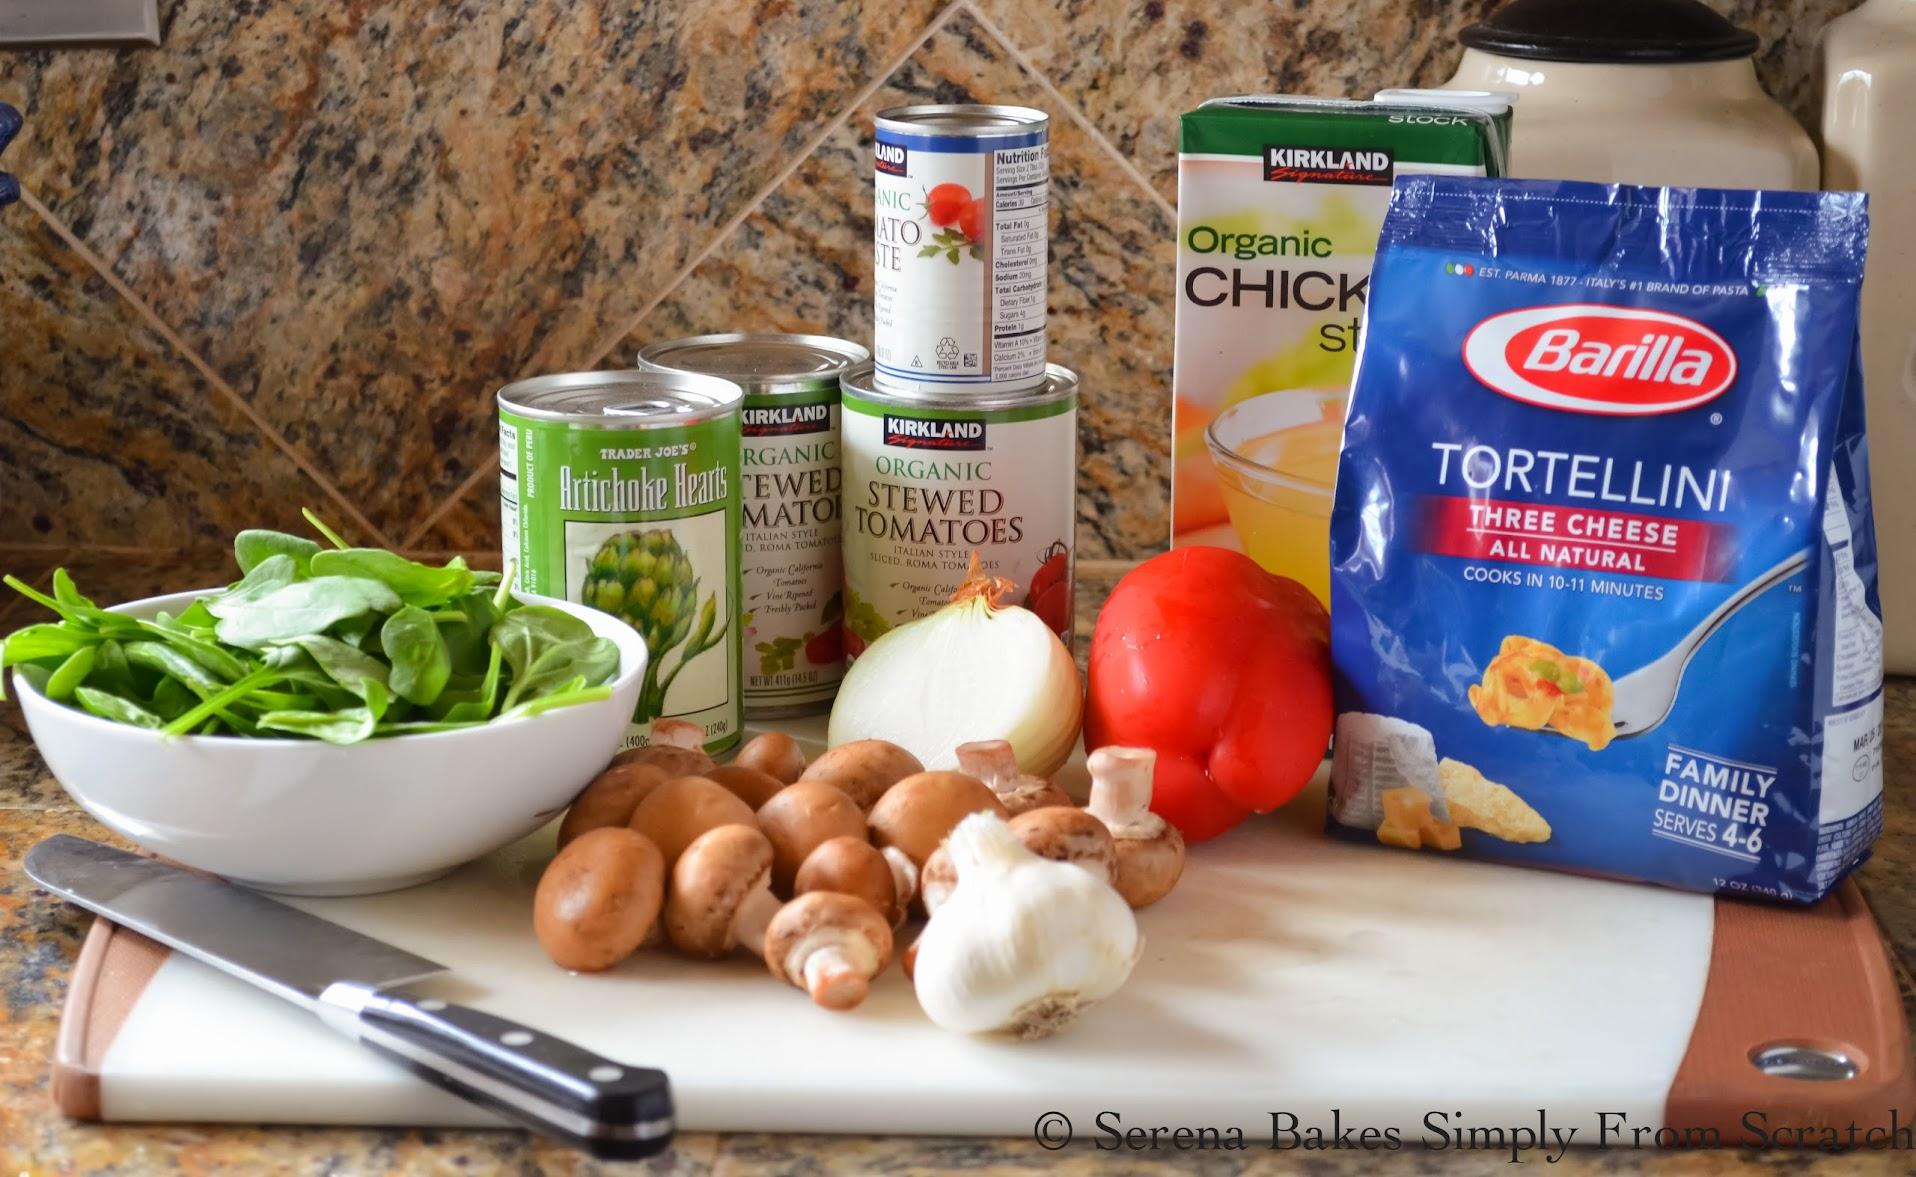 One-Pot-Tortellini-Sausage-Spinach-Artichokes-Barilla-Tortellini.jpg